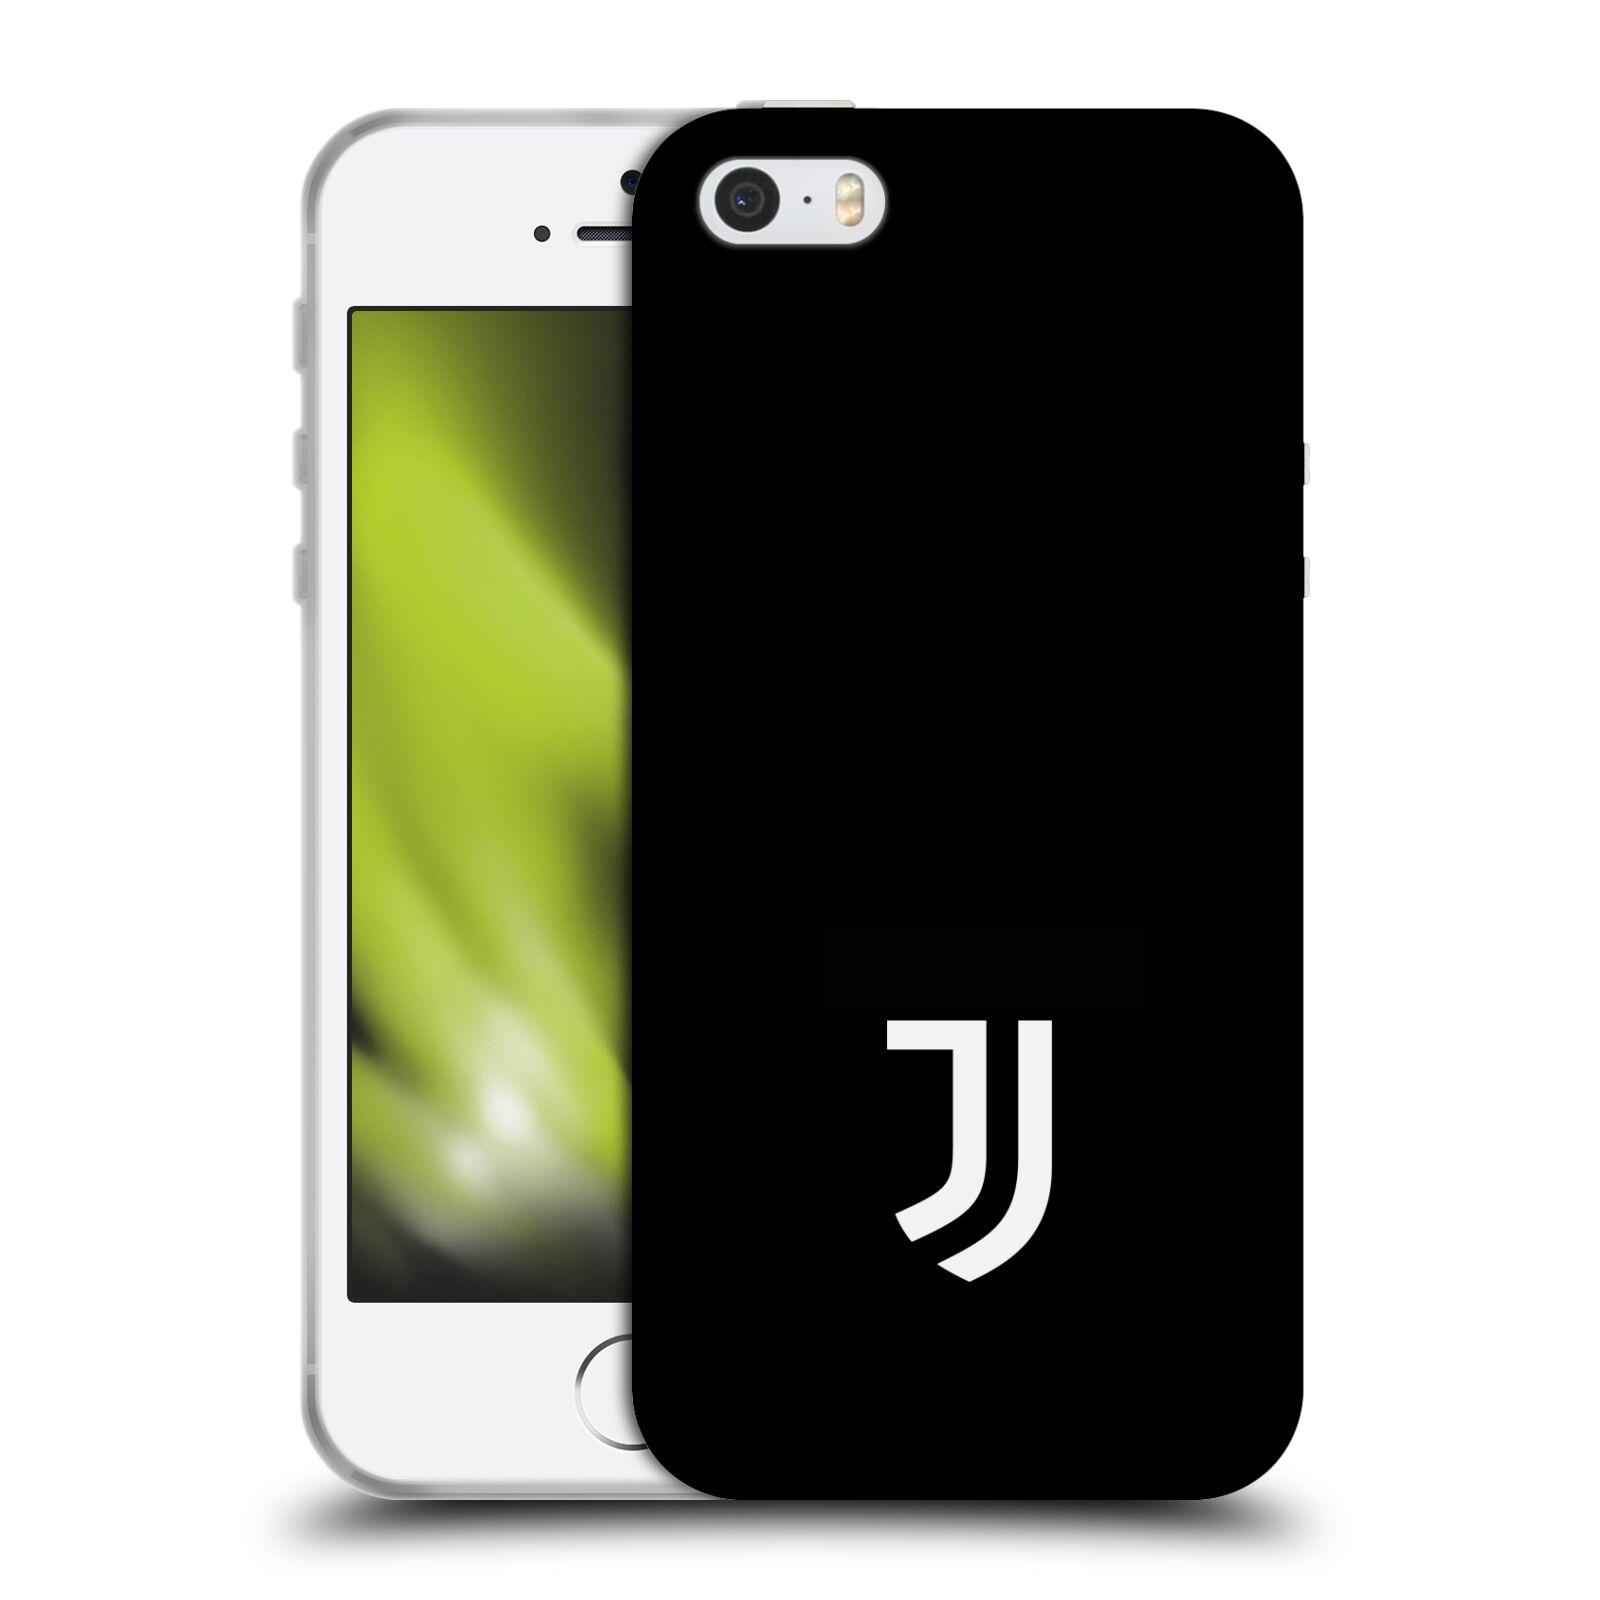 HEAD CASE silikonový obal na mobil Apple Iphone 5 5S Fotbalový klub  Juventus FC černé pozadí bílý znak malý 3e15d443896